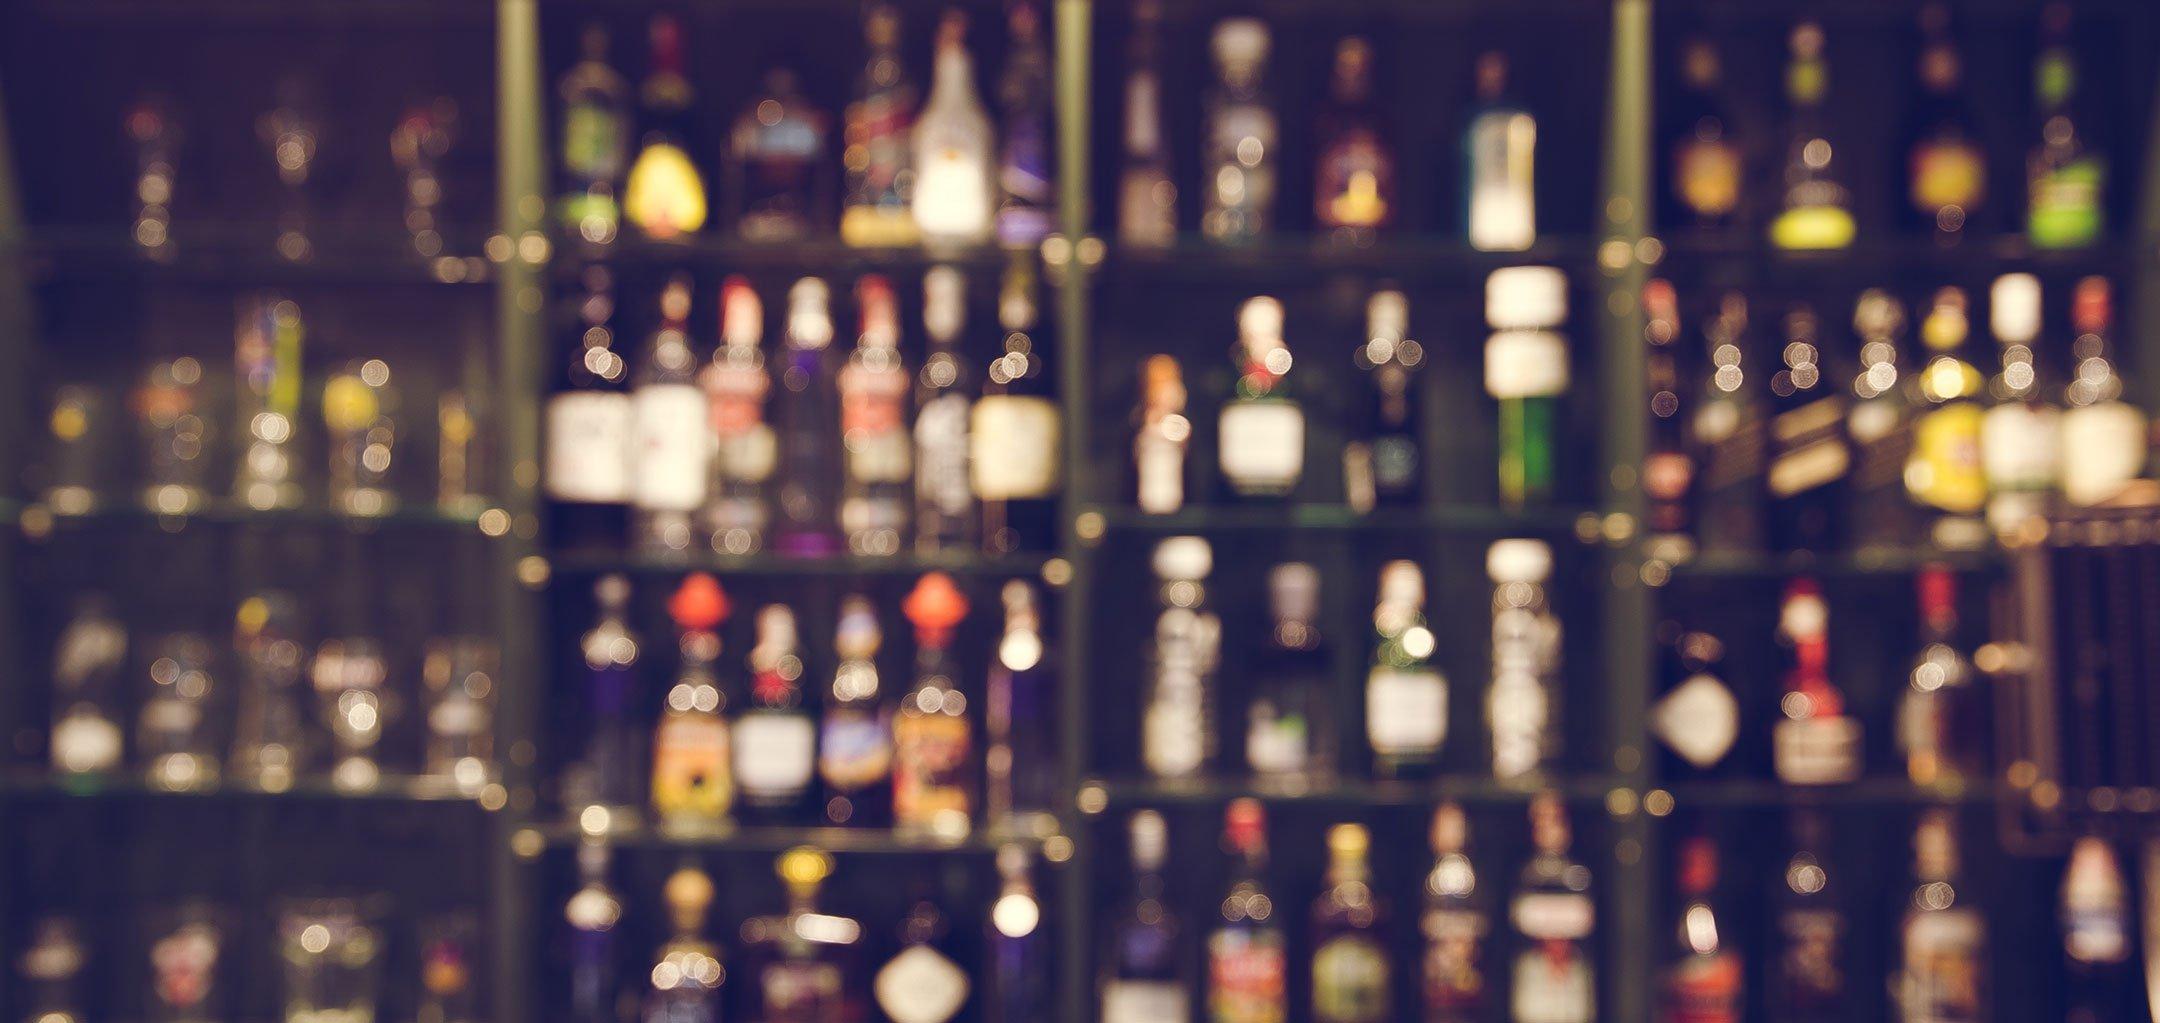 blurred bar shelf